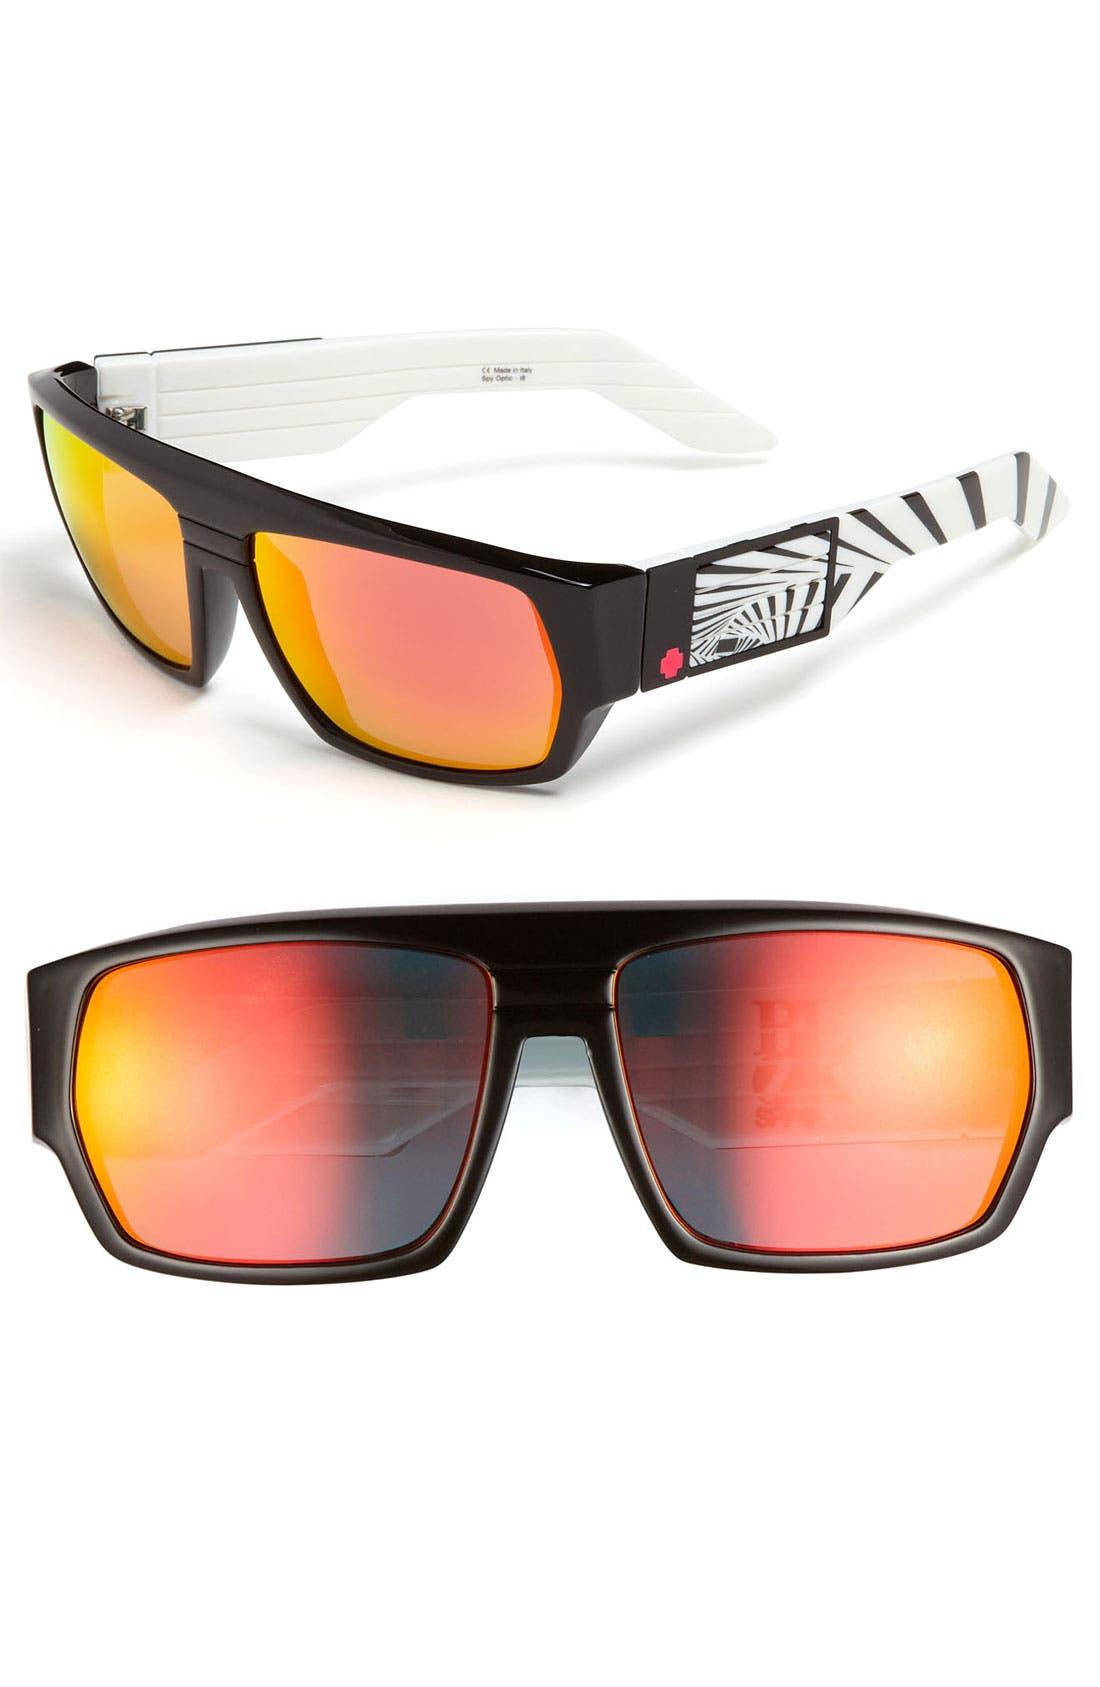 Main Image - SPY Optic 'Blok' Sunglasses